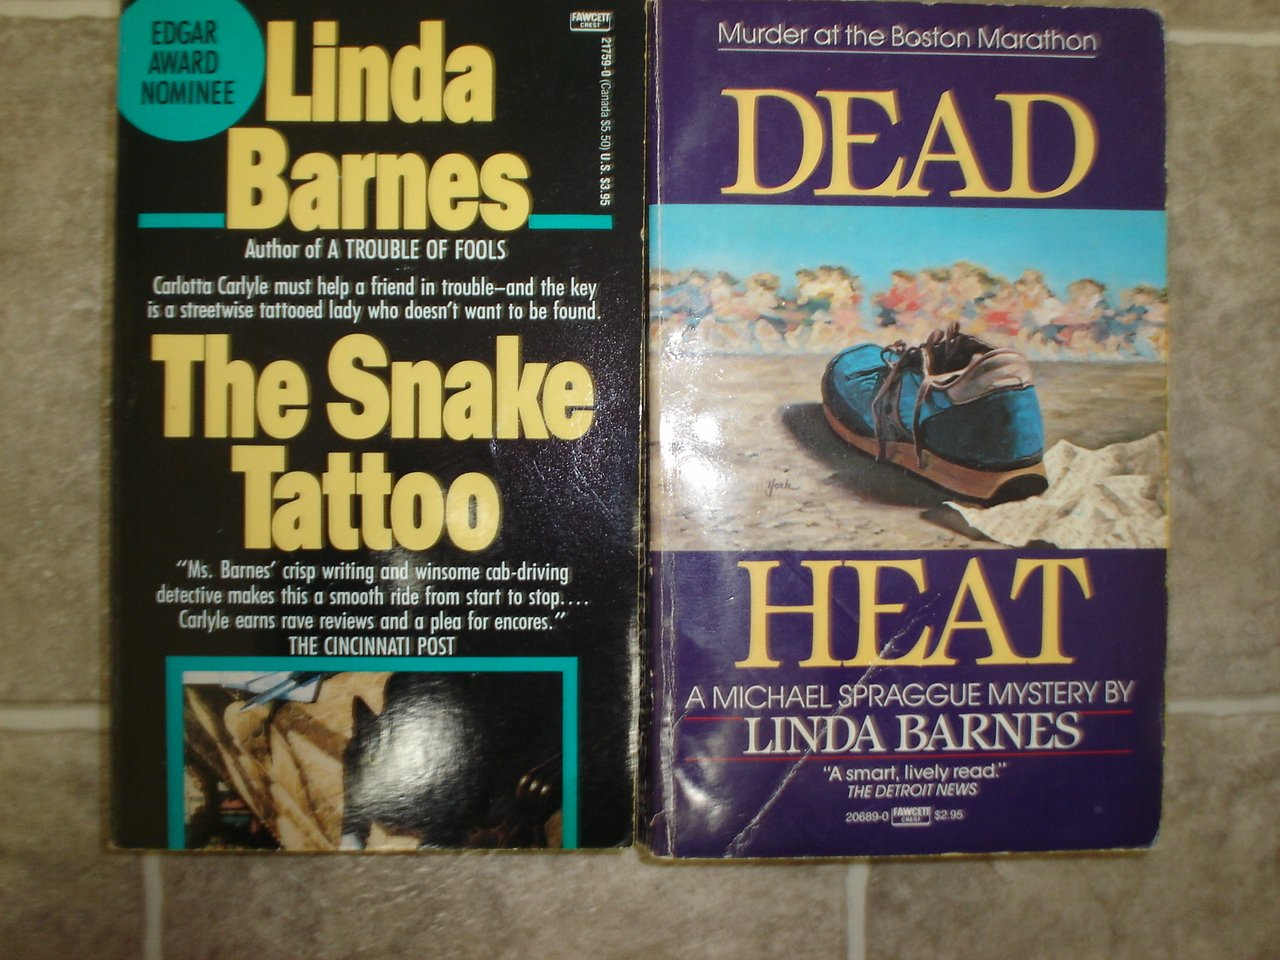 Linda Barnes lot of 2 pb mystery books Boston